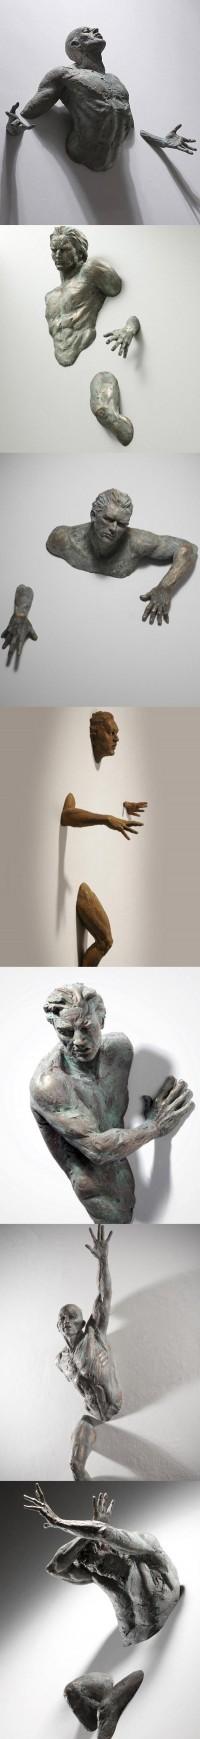 Matteo Pugliese | Artskills